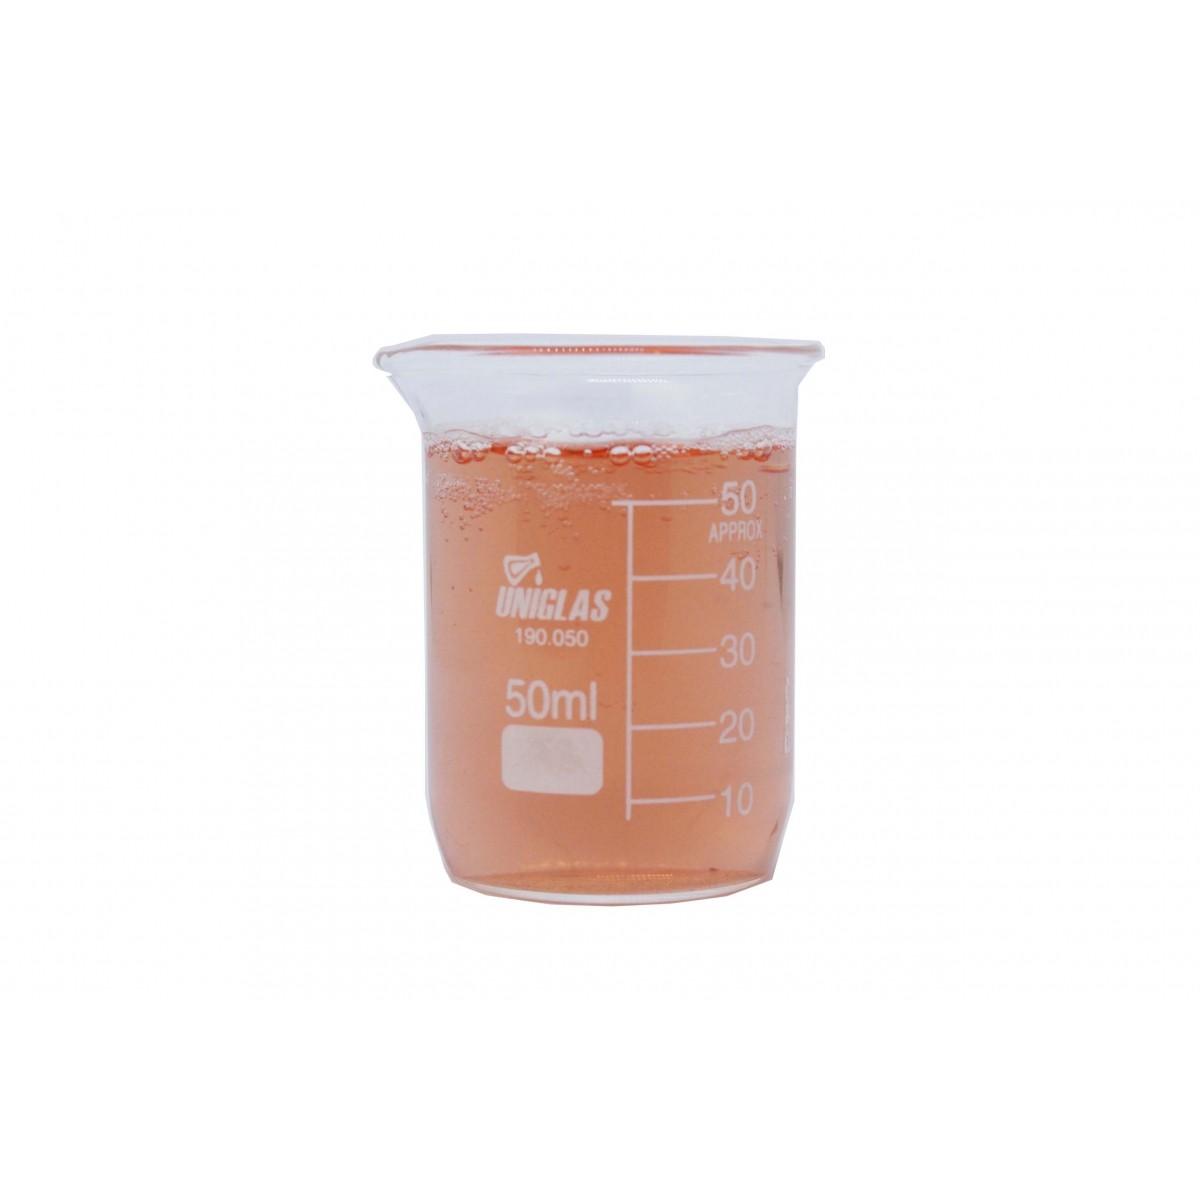 Dosador de vidro - 50ml